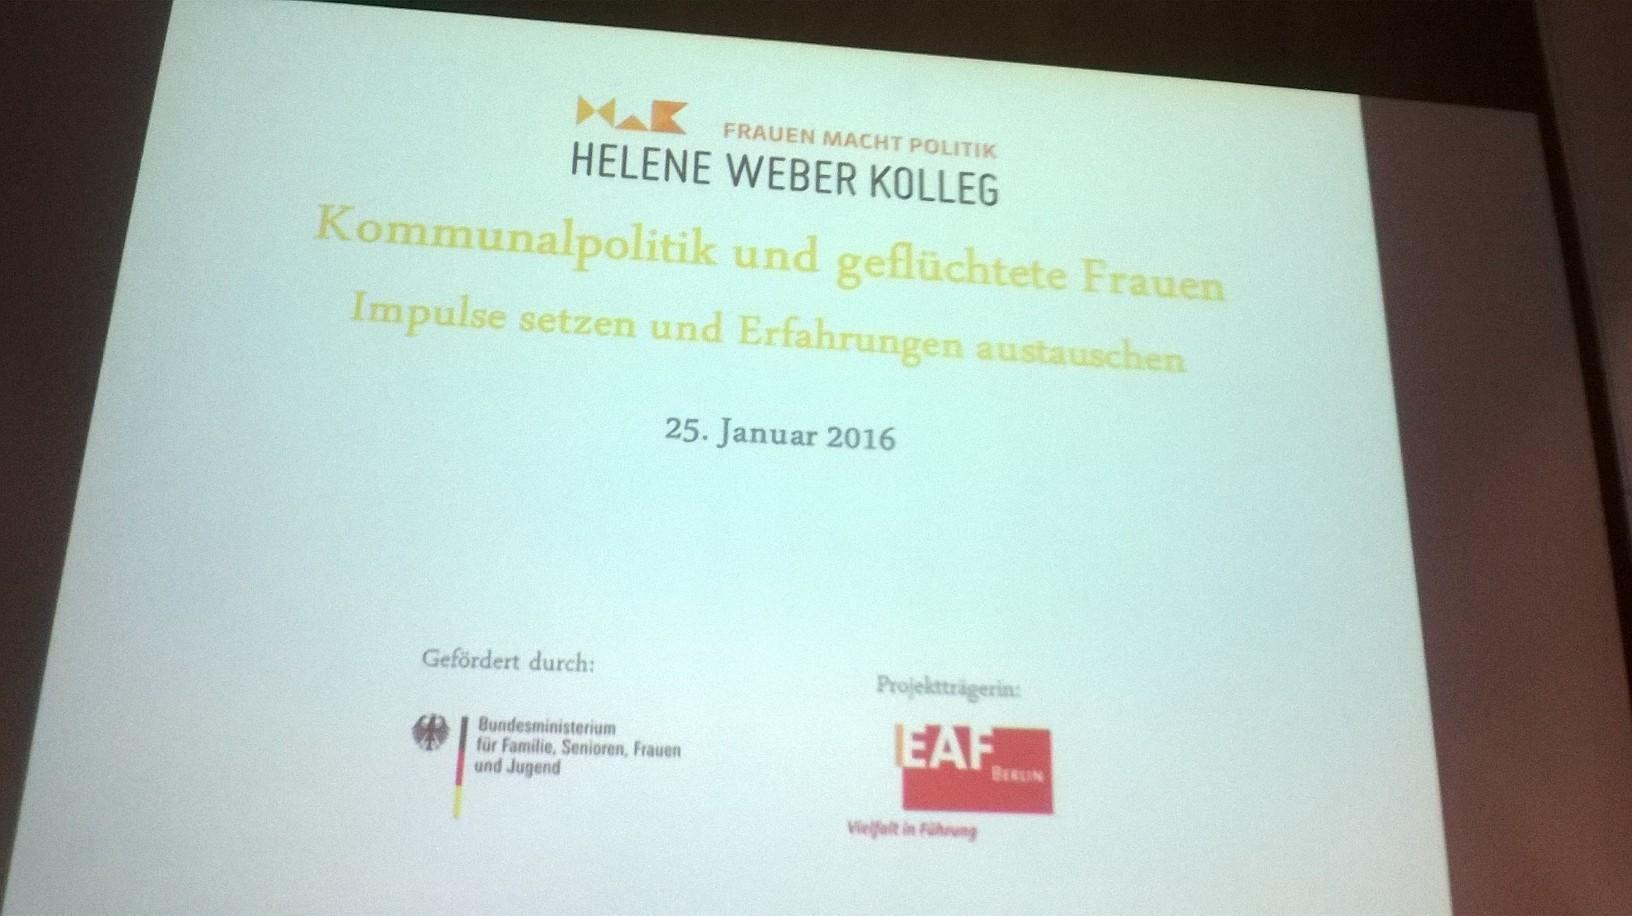 HeleneWeberKolleg_3